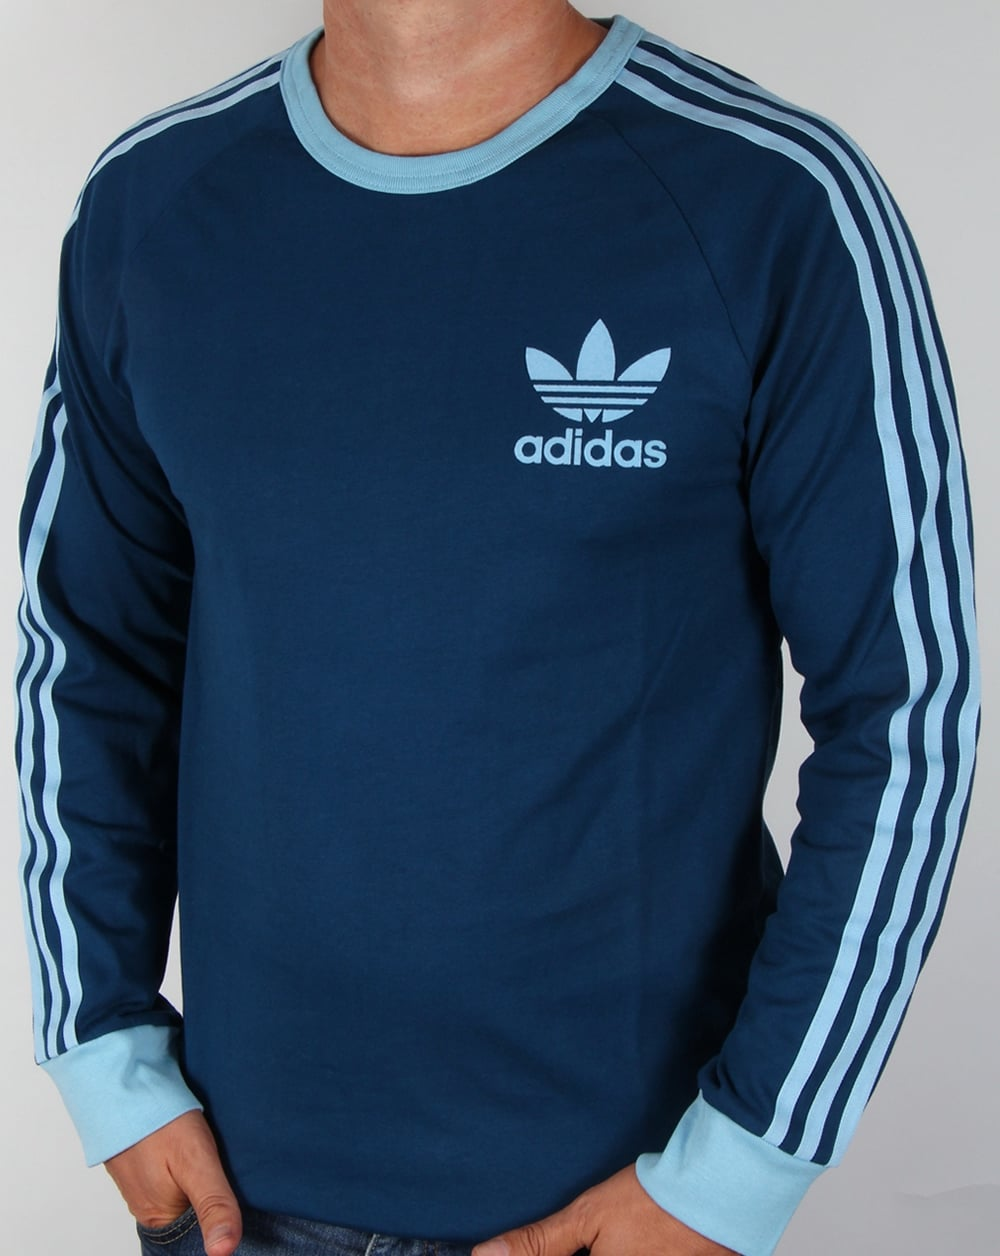 Adidas originals adicolour long sleeve t shirt shadow blue for A long sleeve shirt